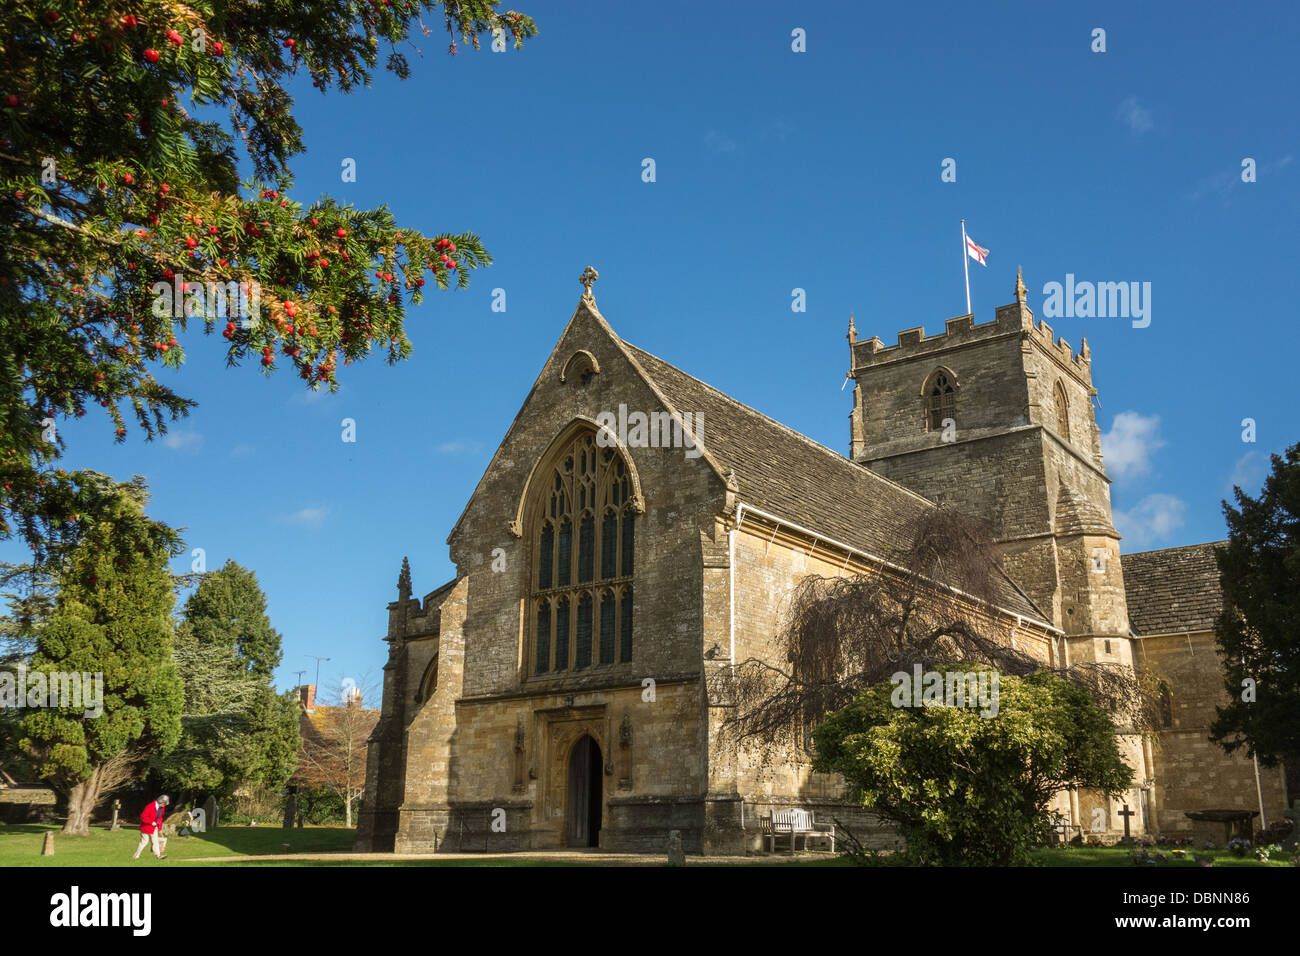 The ancient Christian church of St John the Evangelist, Milborne Port, Somerset, UK Stock Photo